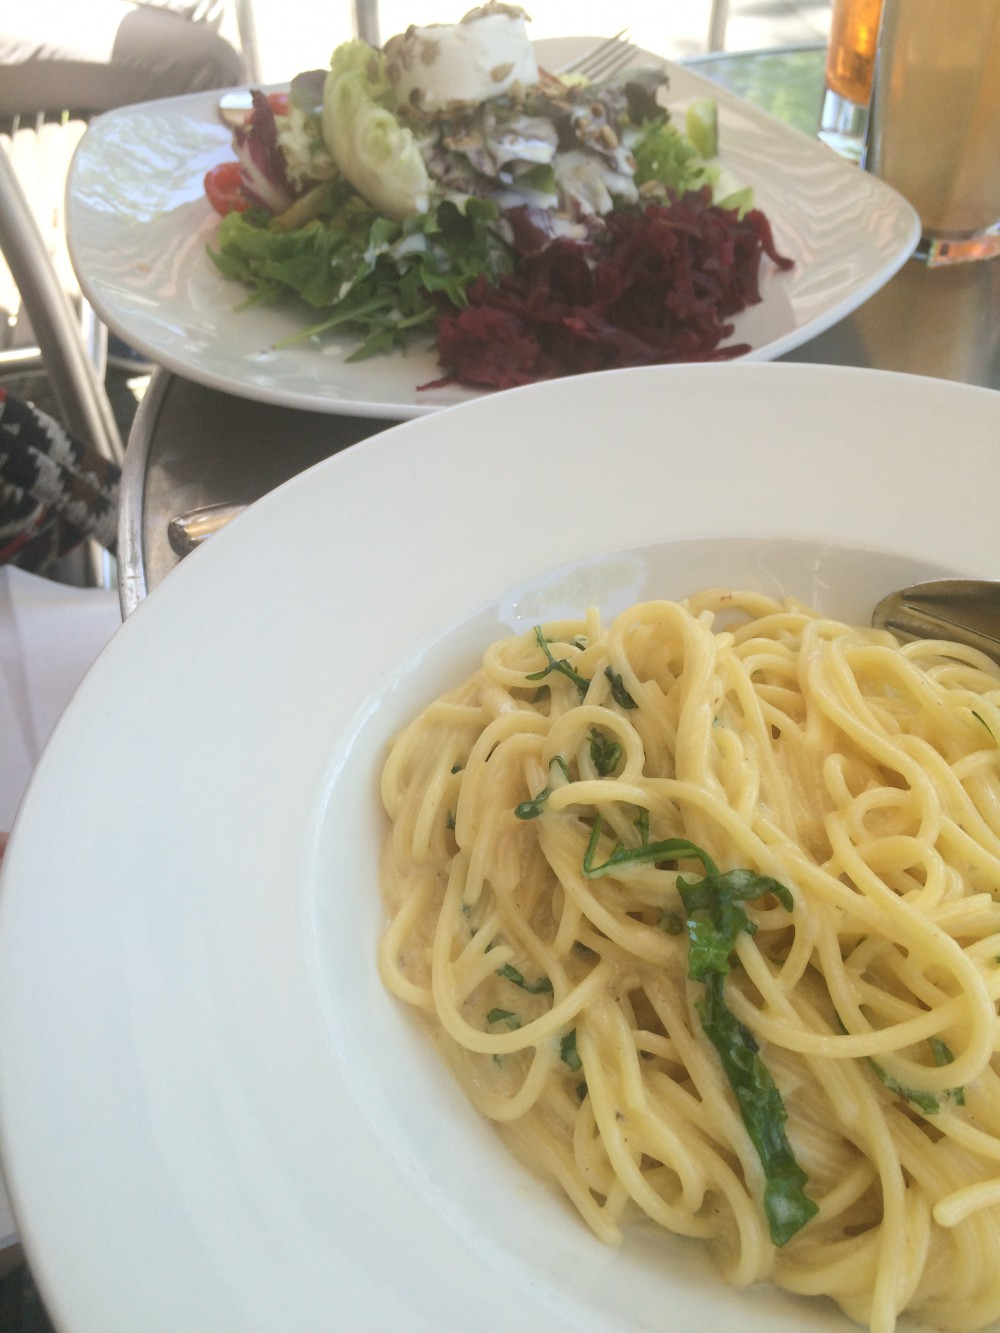 Salat mit Ziegenkäse - Pasta mit Pesto - Del Fiore